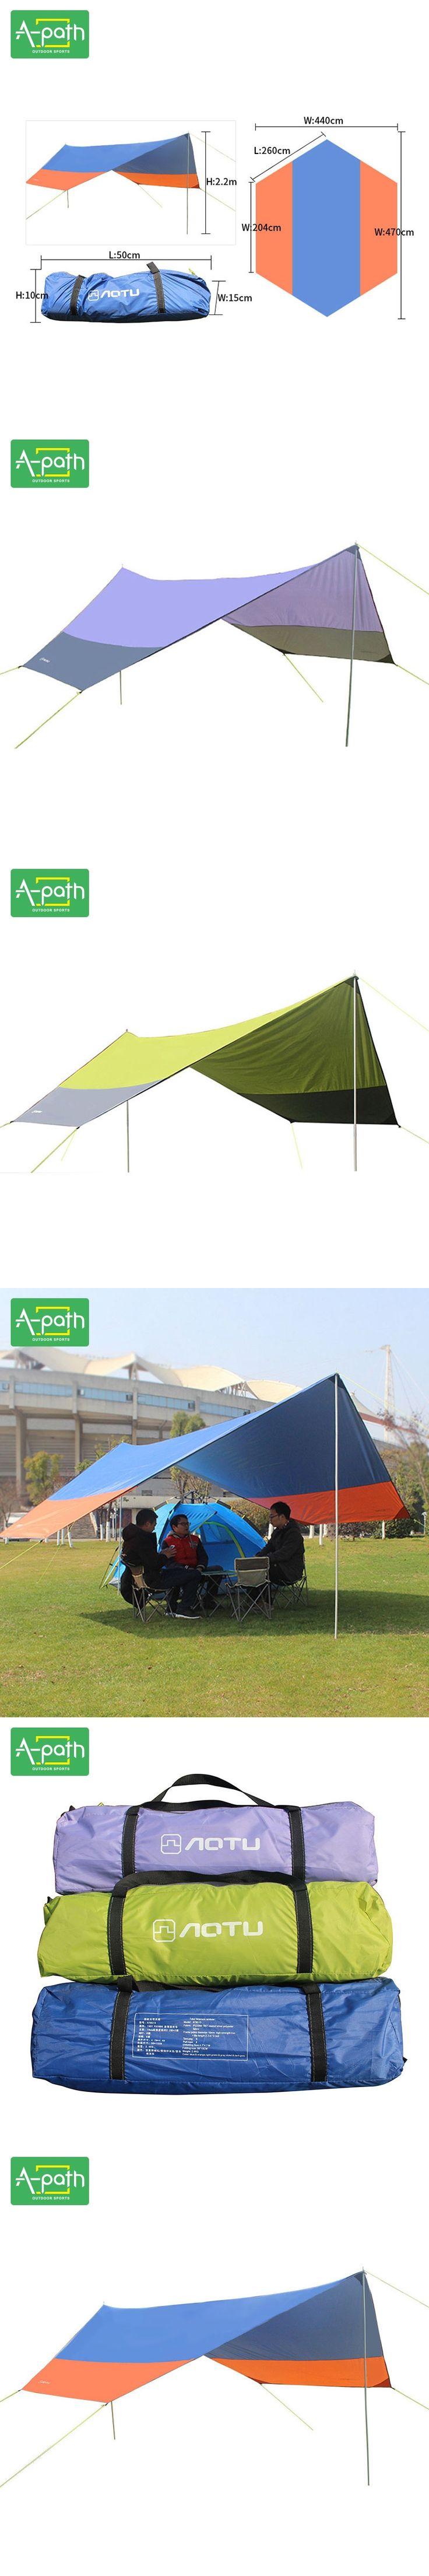 8 Person Large Outdoor Camping Sun Shelter Tarp Awning Beach Fishing Umbrella Party Garden Folding Car Tent Arbor Snowglobe